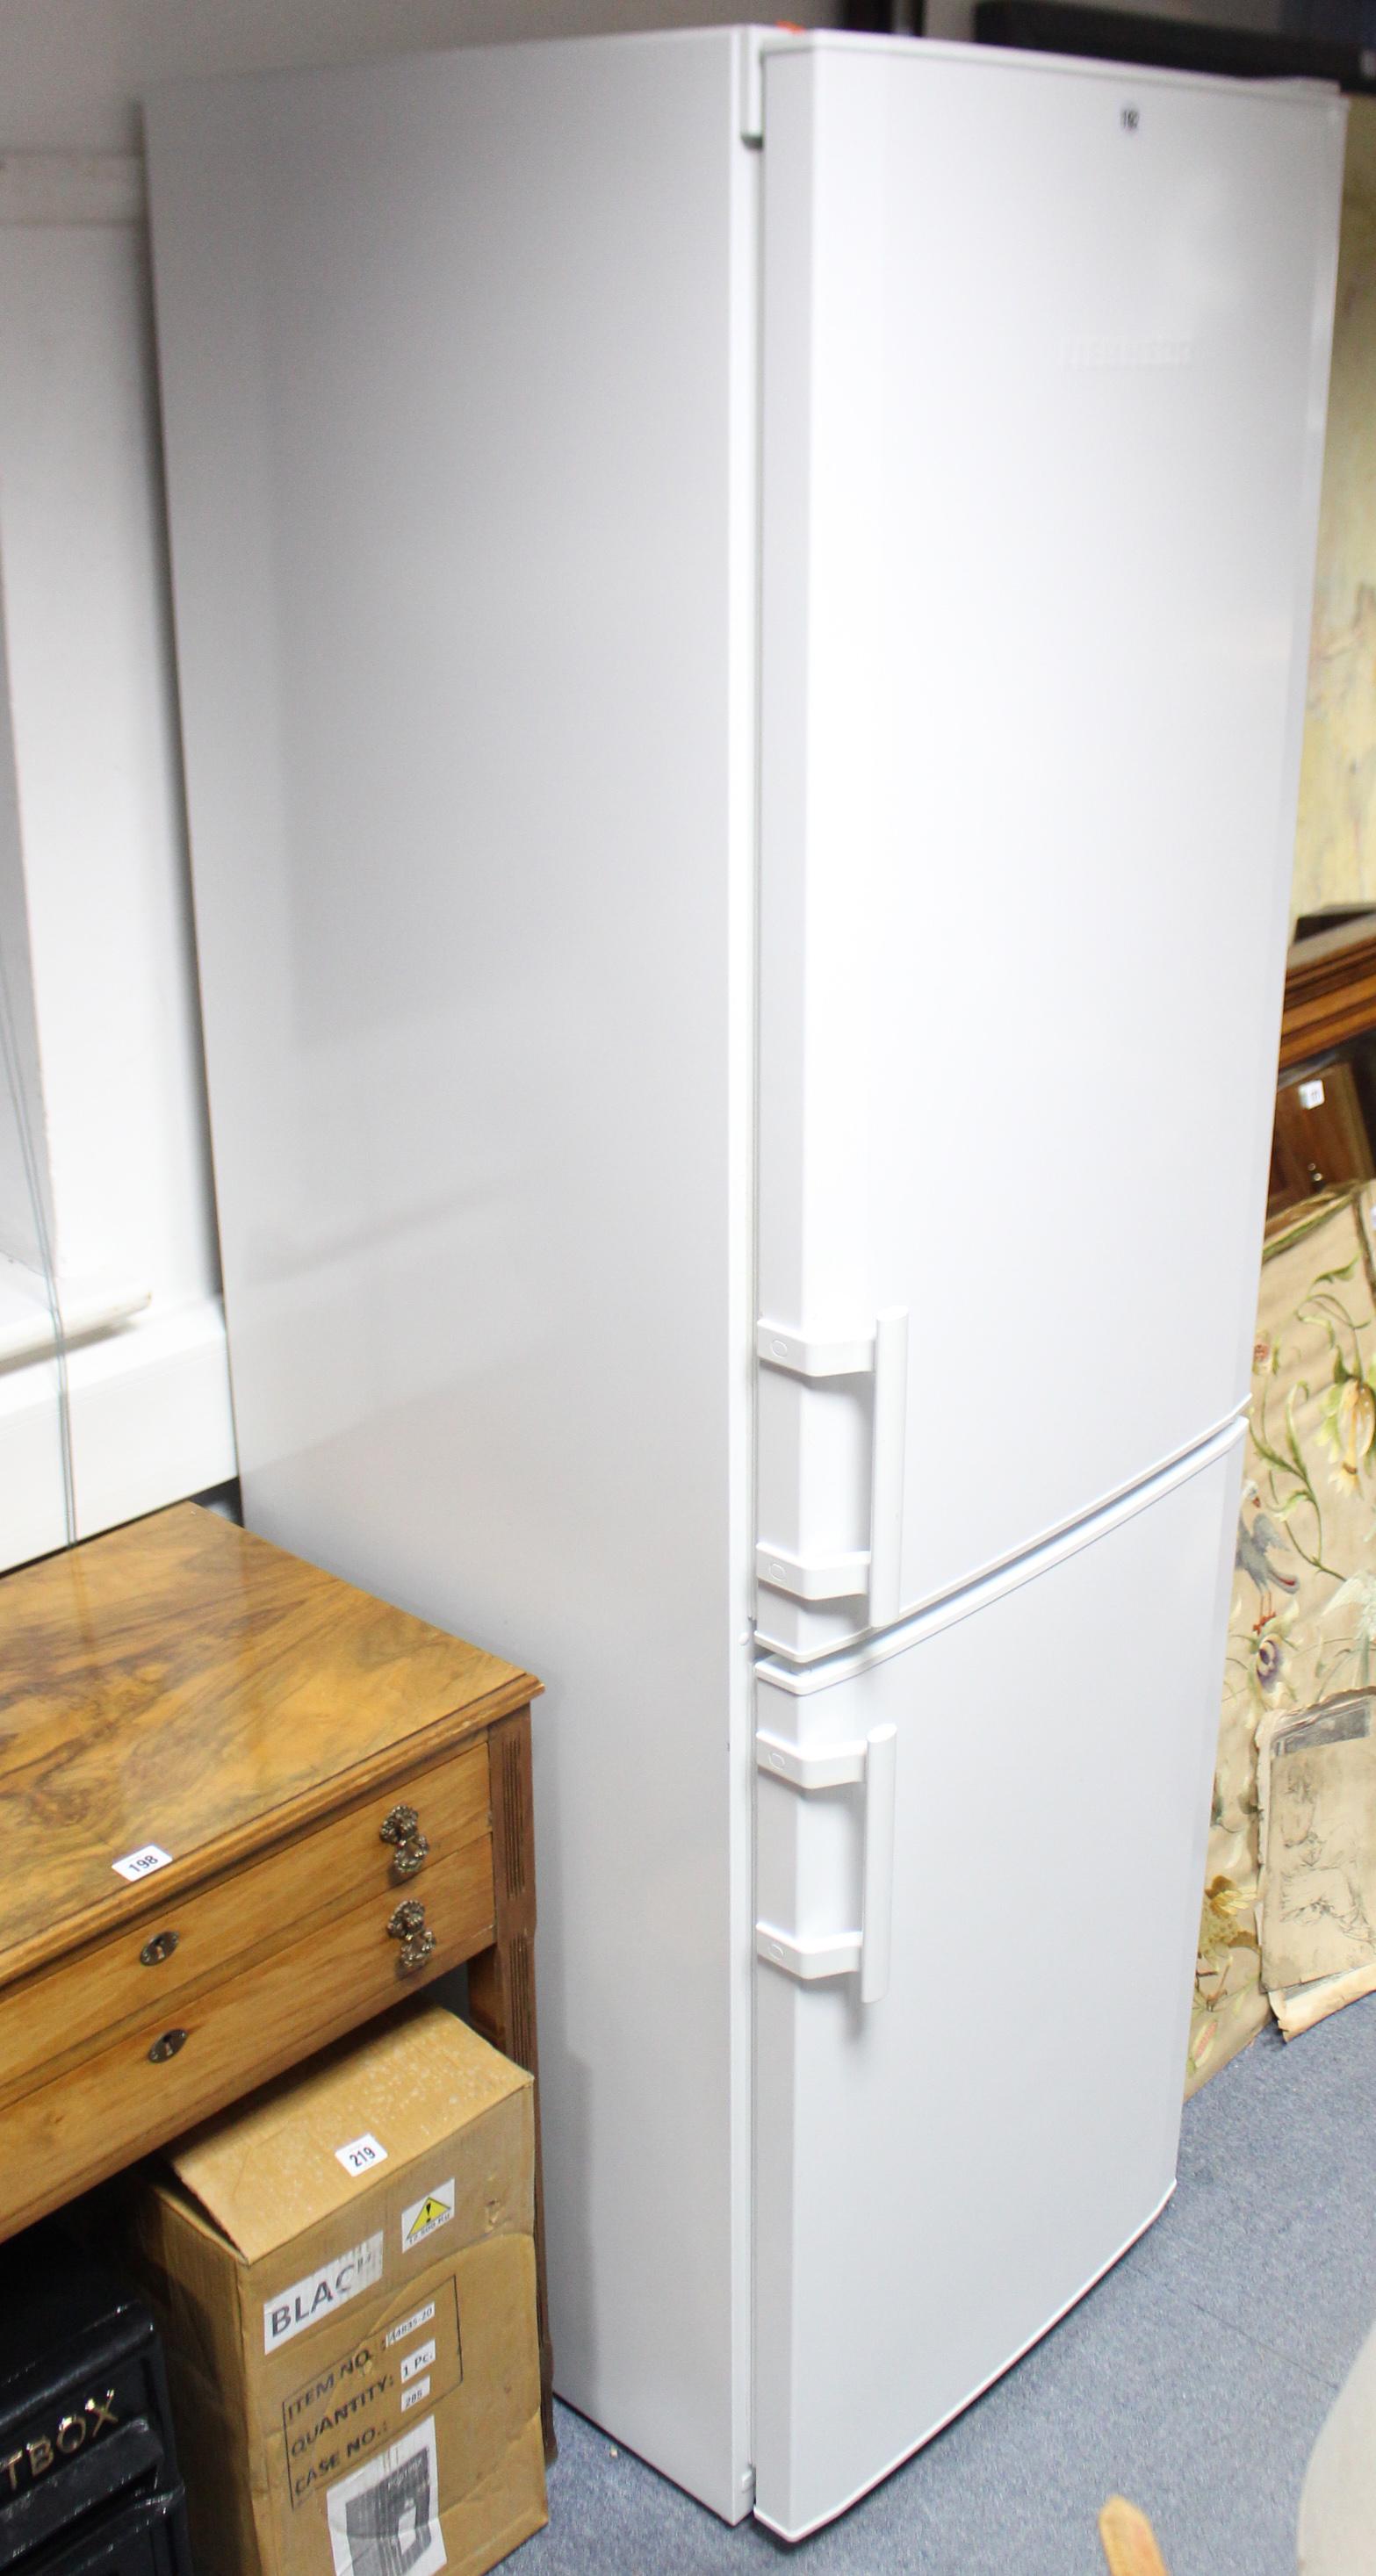 "Lot 192 - A Liebherr upright fridge-freezer in white finish case, 21"" wide x 70¾"" high."